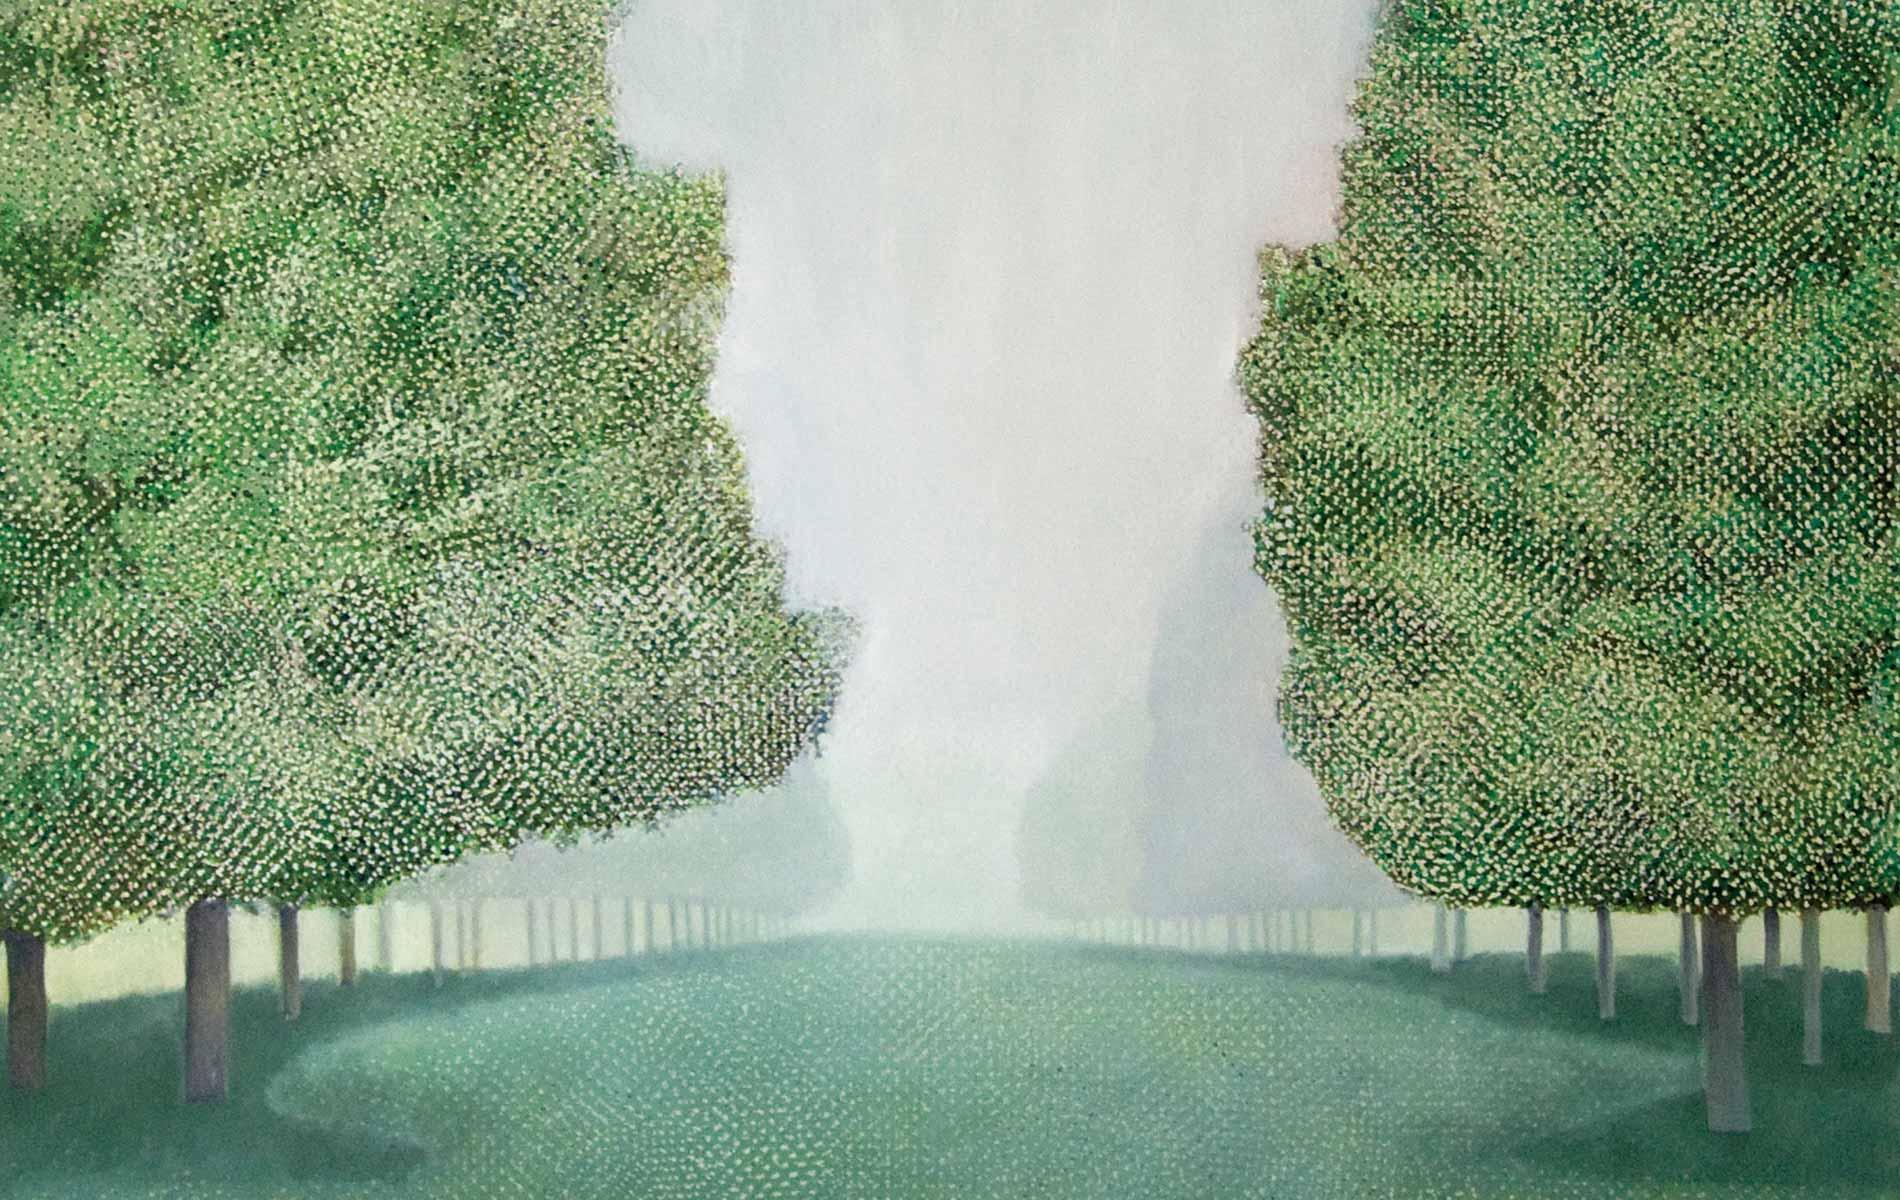 vie-magazine-steve-wagner-painting